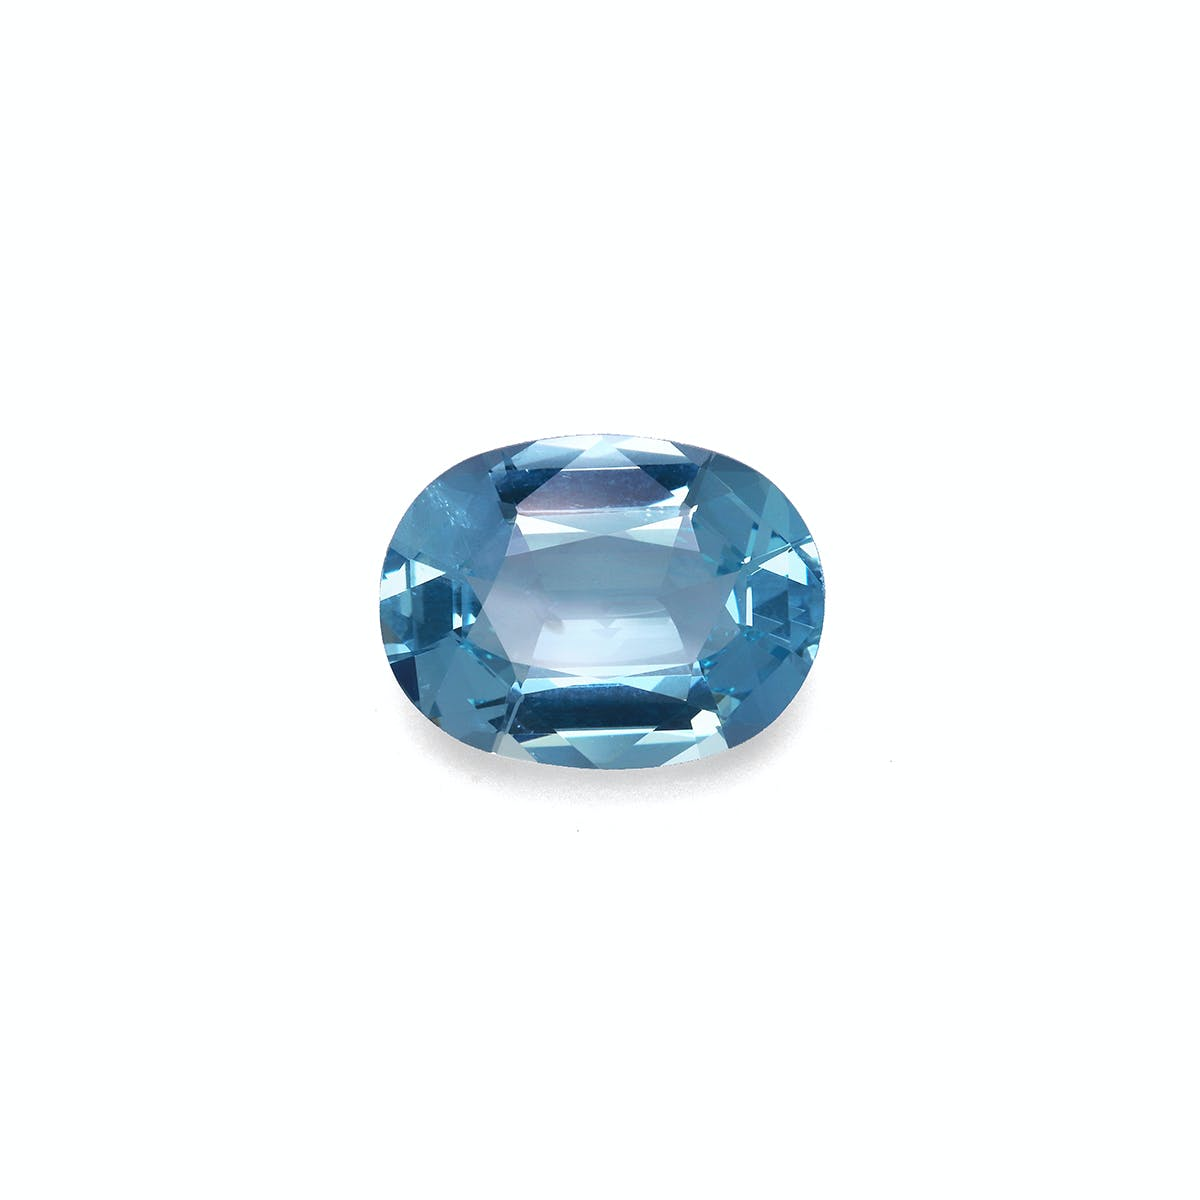 Aquamarine Stone Healing Superb Quality Gemstone Semi Precious Valentine Gift Stone 34X34X07 MM Pretty Aquamarine Cabochon US-3009